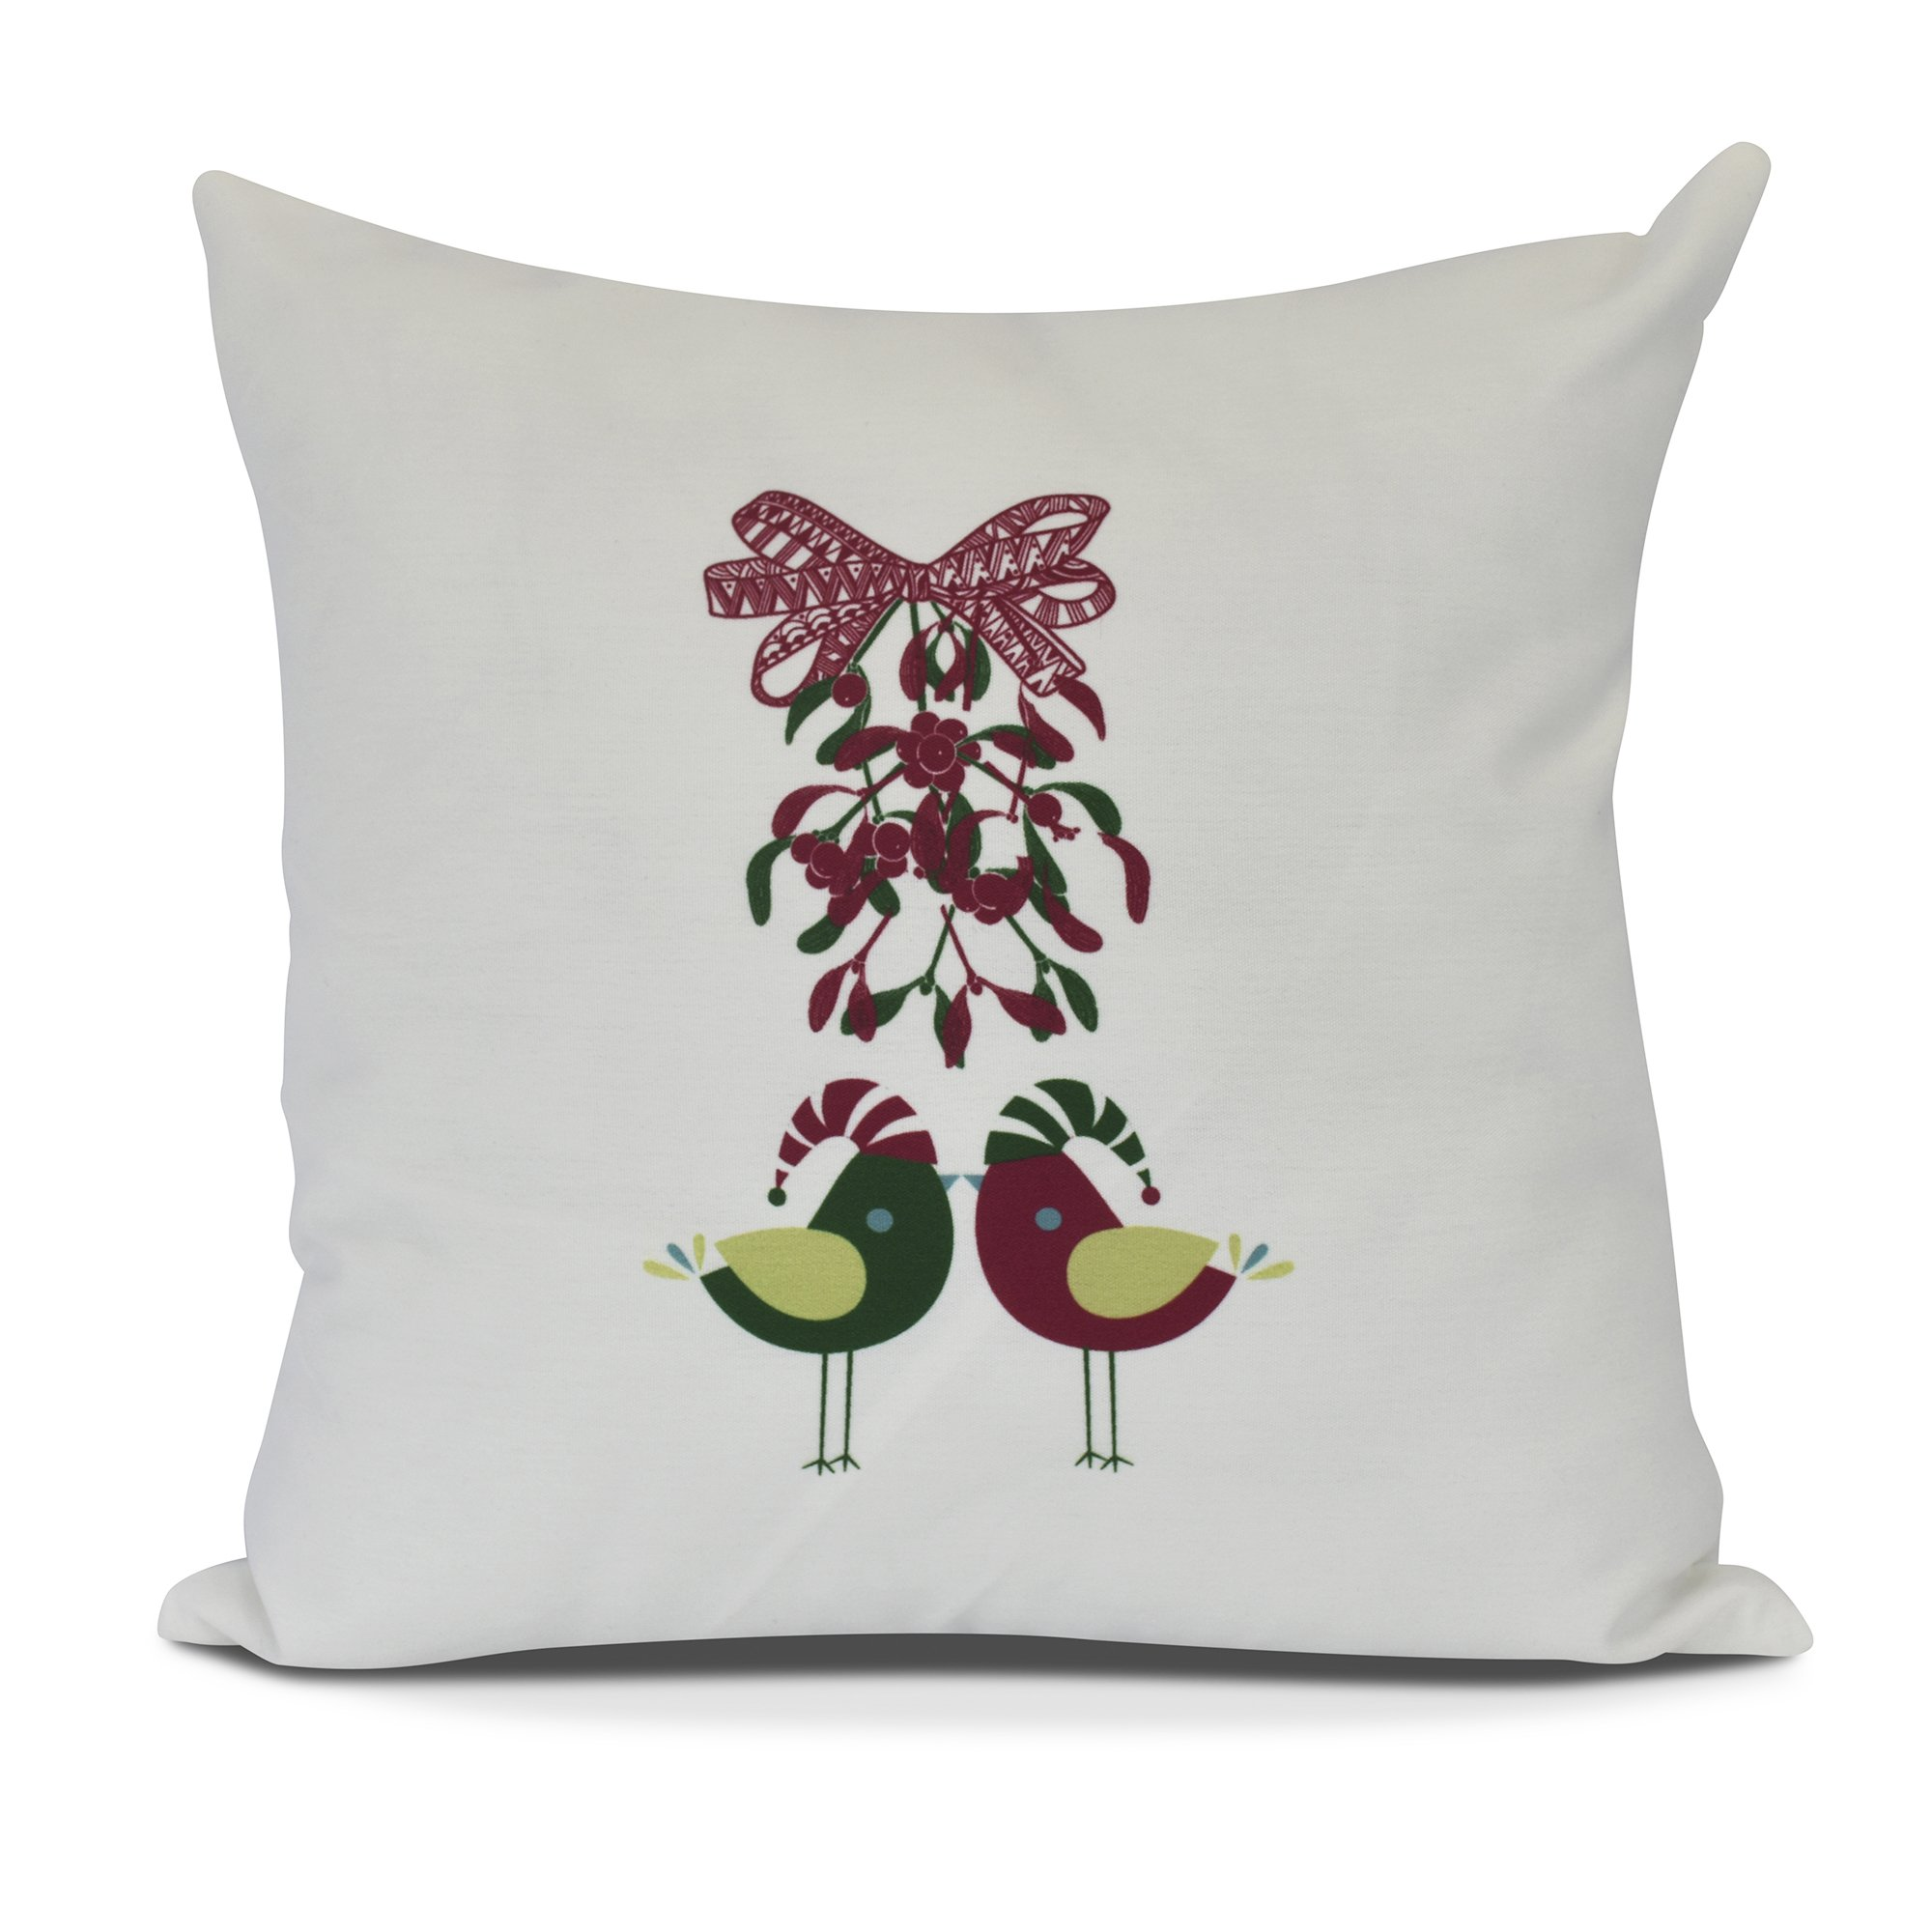 E by design O5PHA982WH1-20 Love Birds Decorative Animal Throw Outdoor Pillow, 20'', White